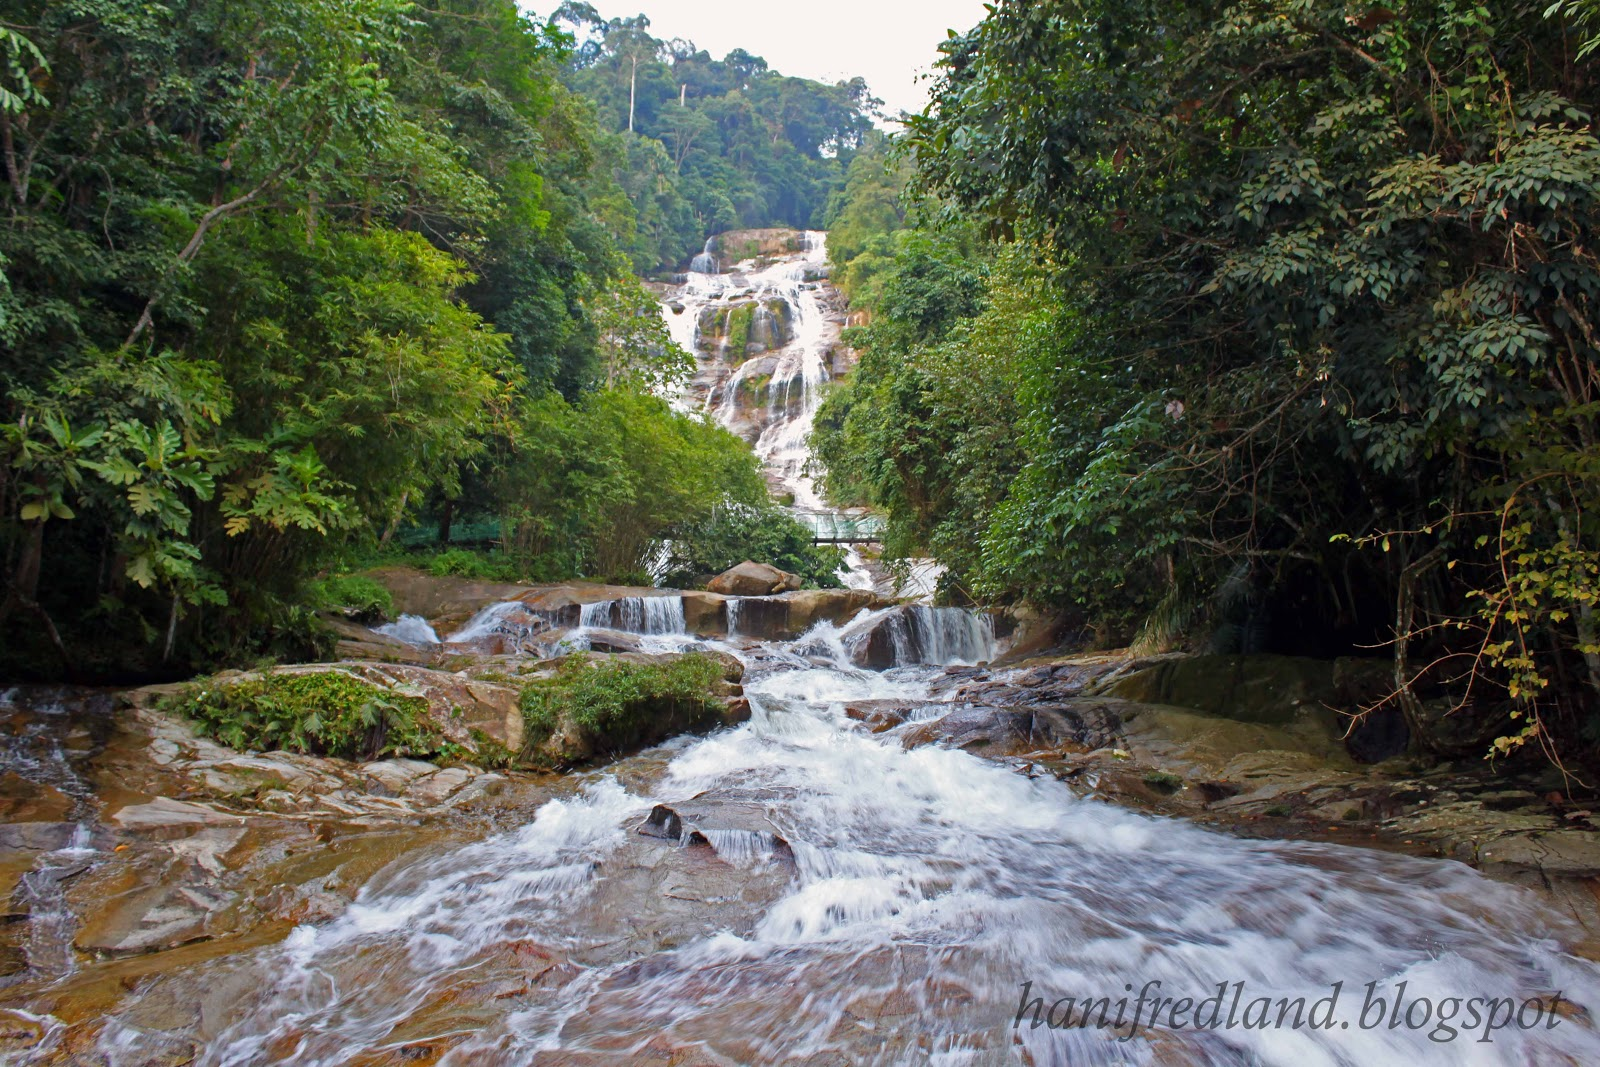 Hanif Redland Lata Kinjang Waterfalls 850 Meters